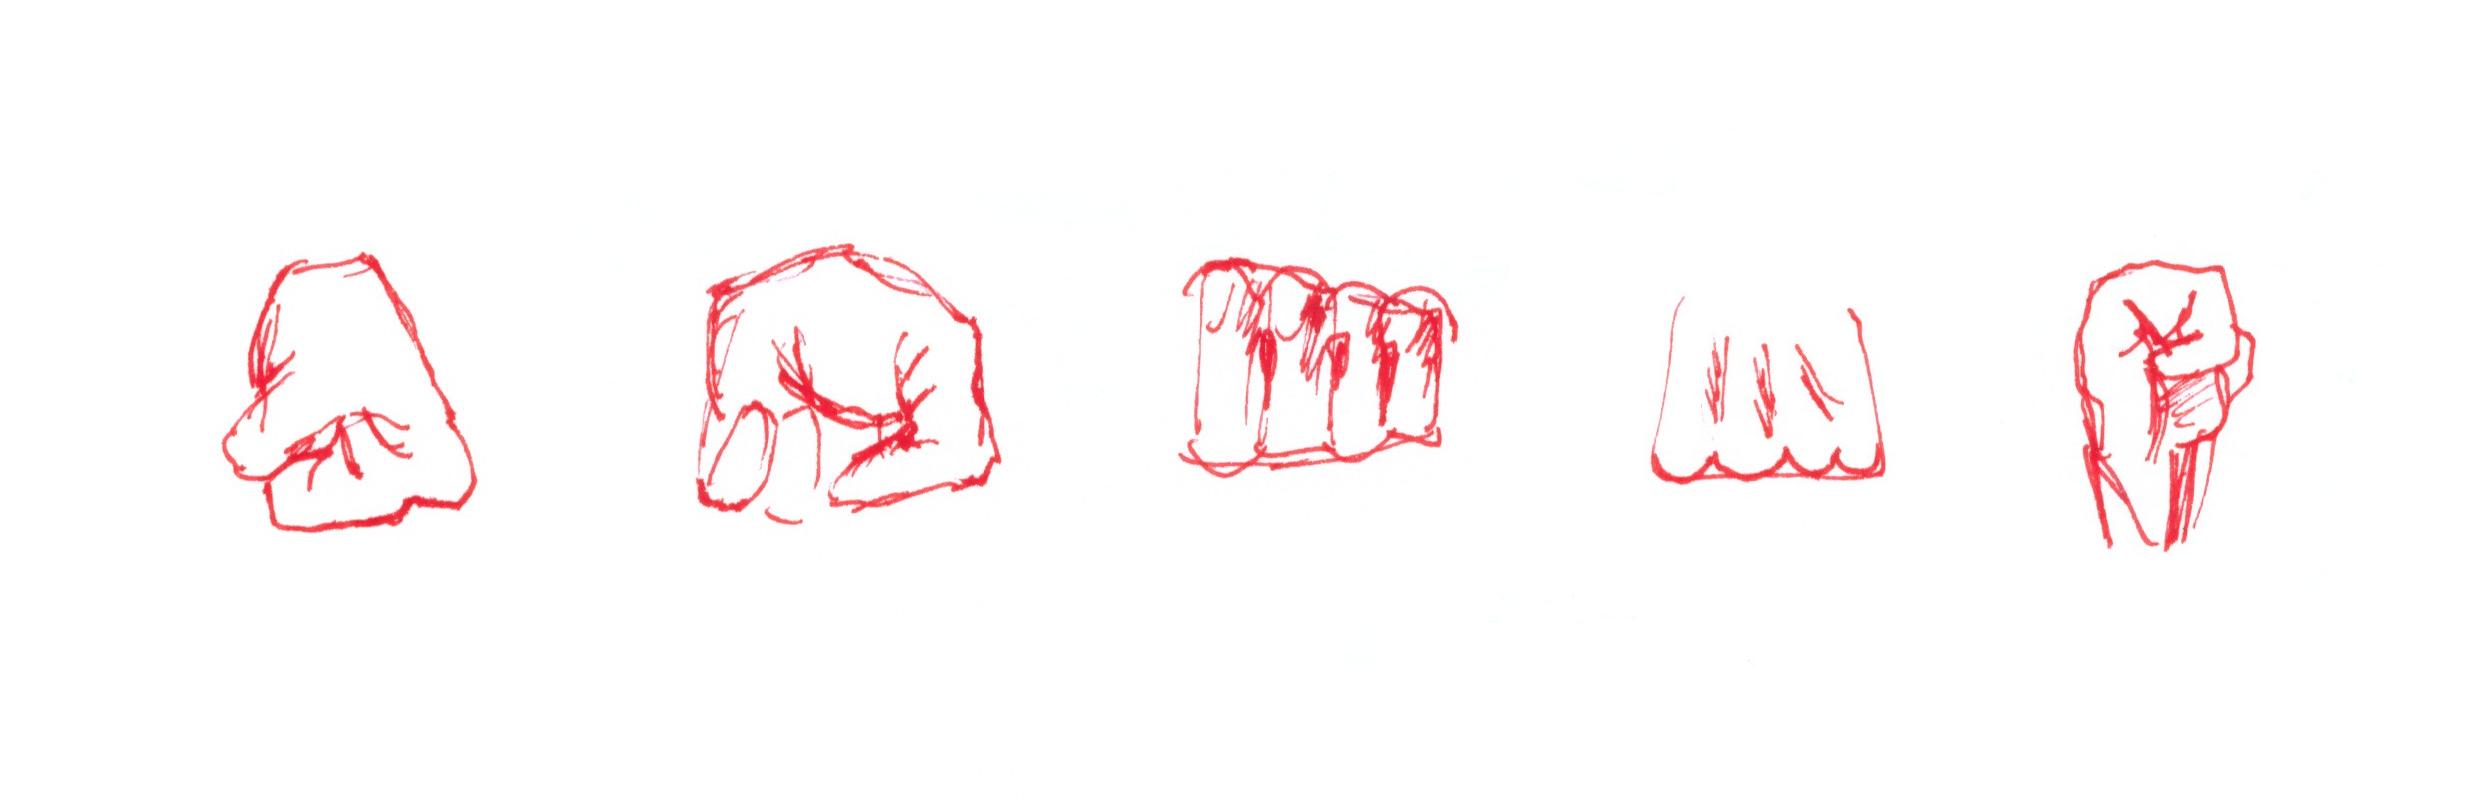 Fist Design